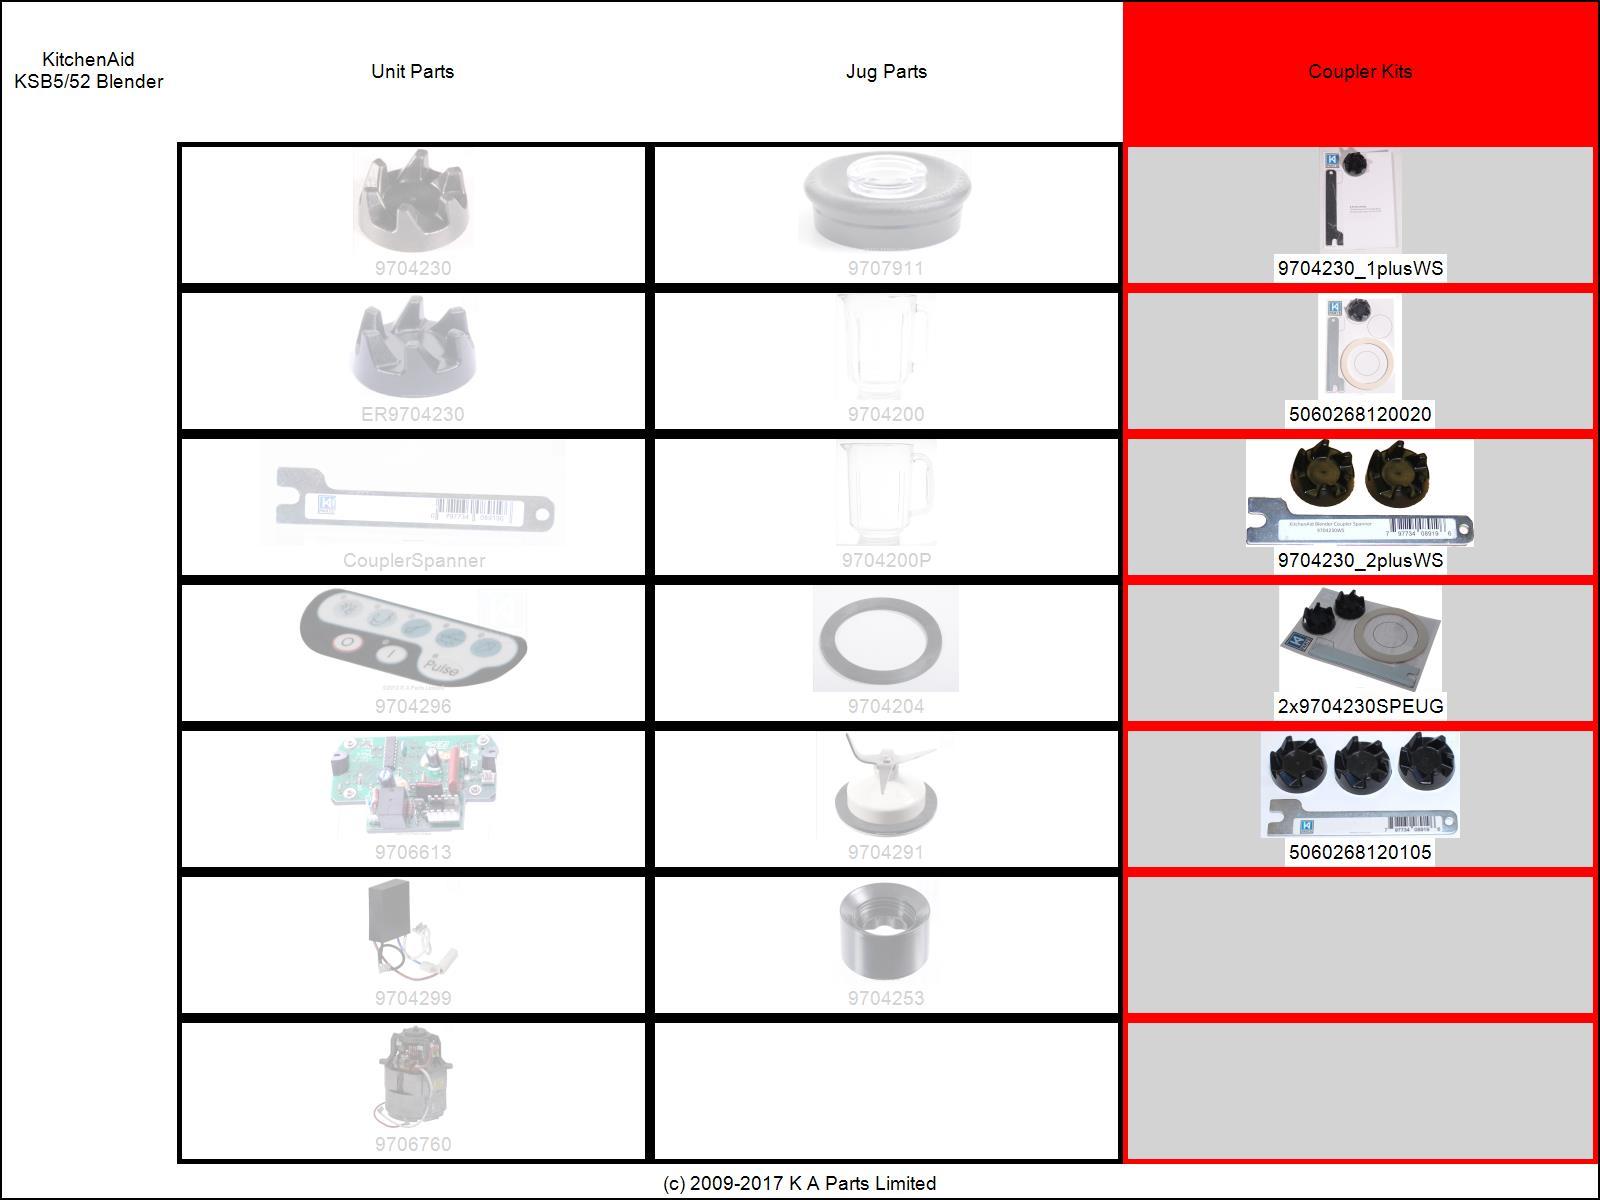 Kitchenaid blender coupler ws fitting tool 9704230 1plusws for kitchenaid blenders - Kitchenaid blender parts uk ...